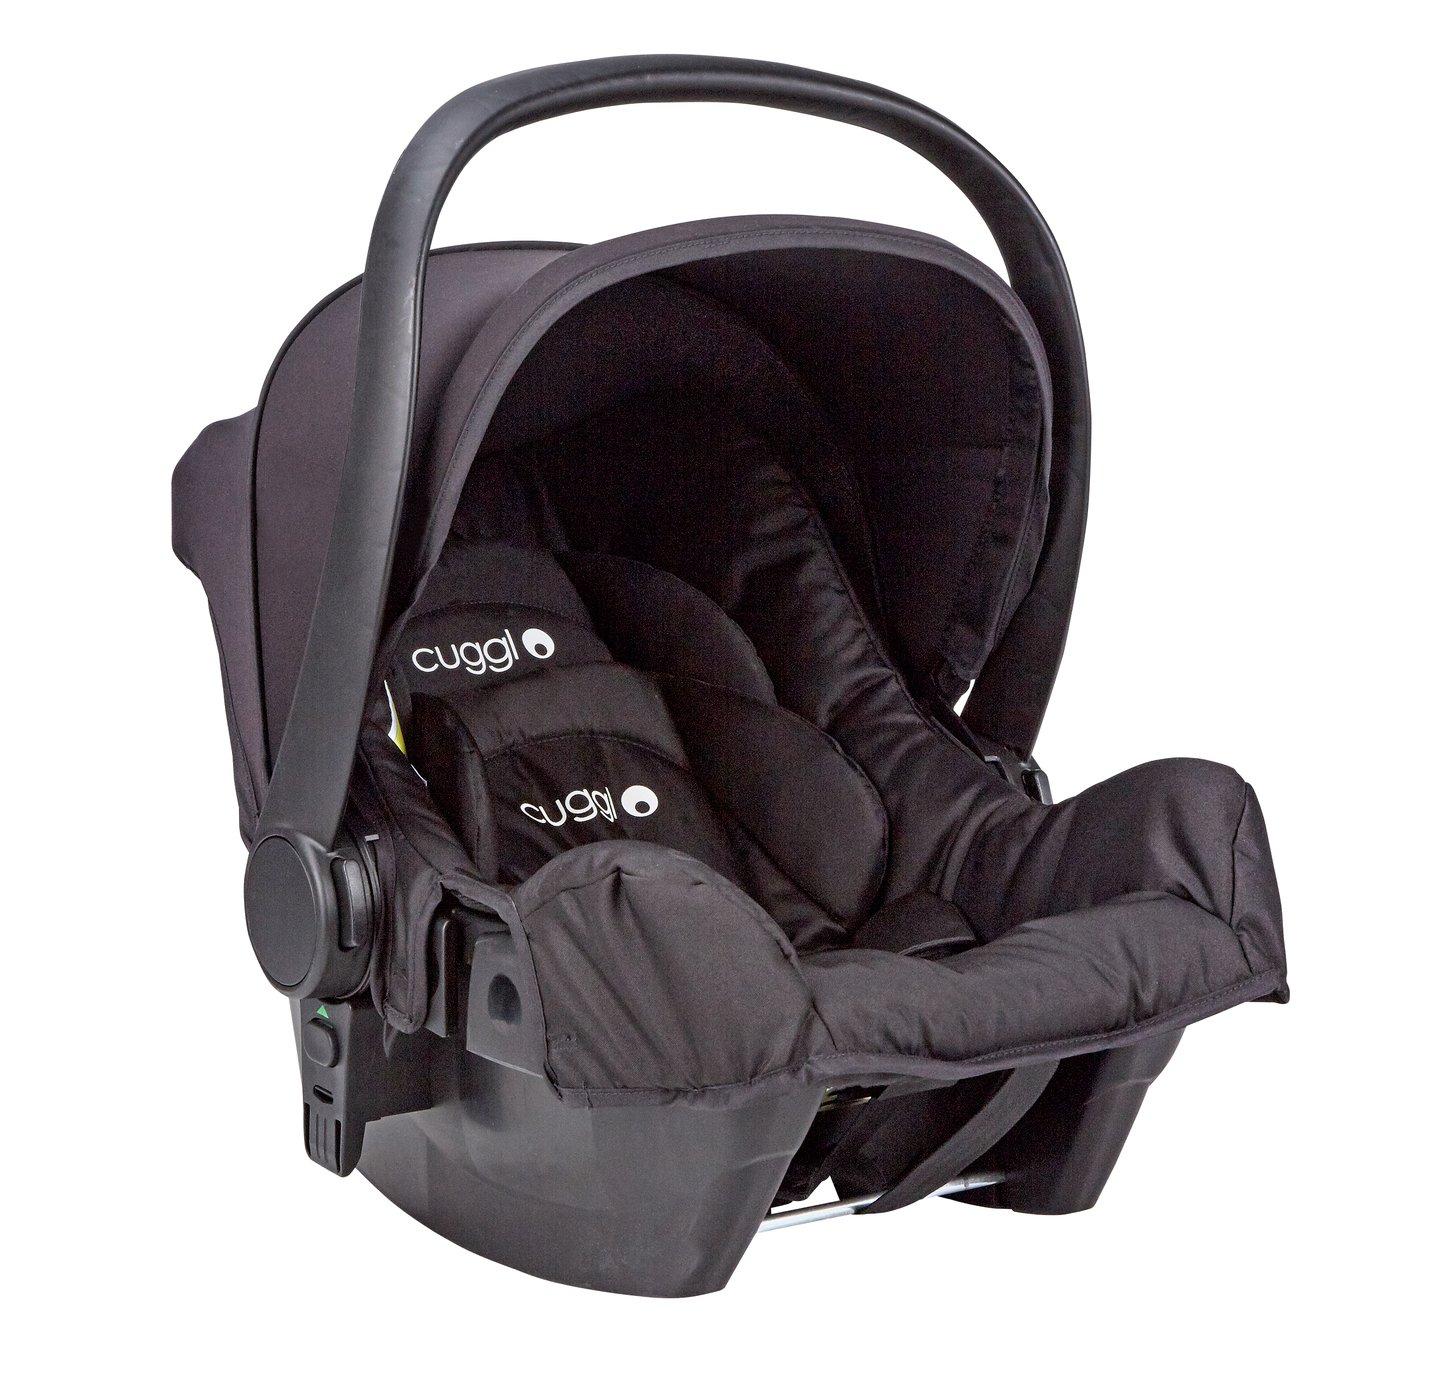 Cuggl Dove Group 0+ Infant Car Seat - Black